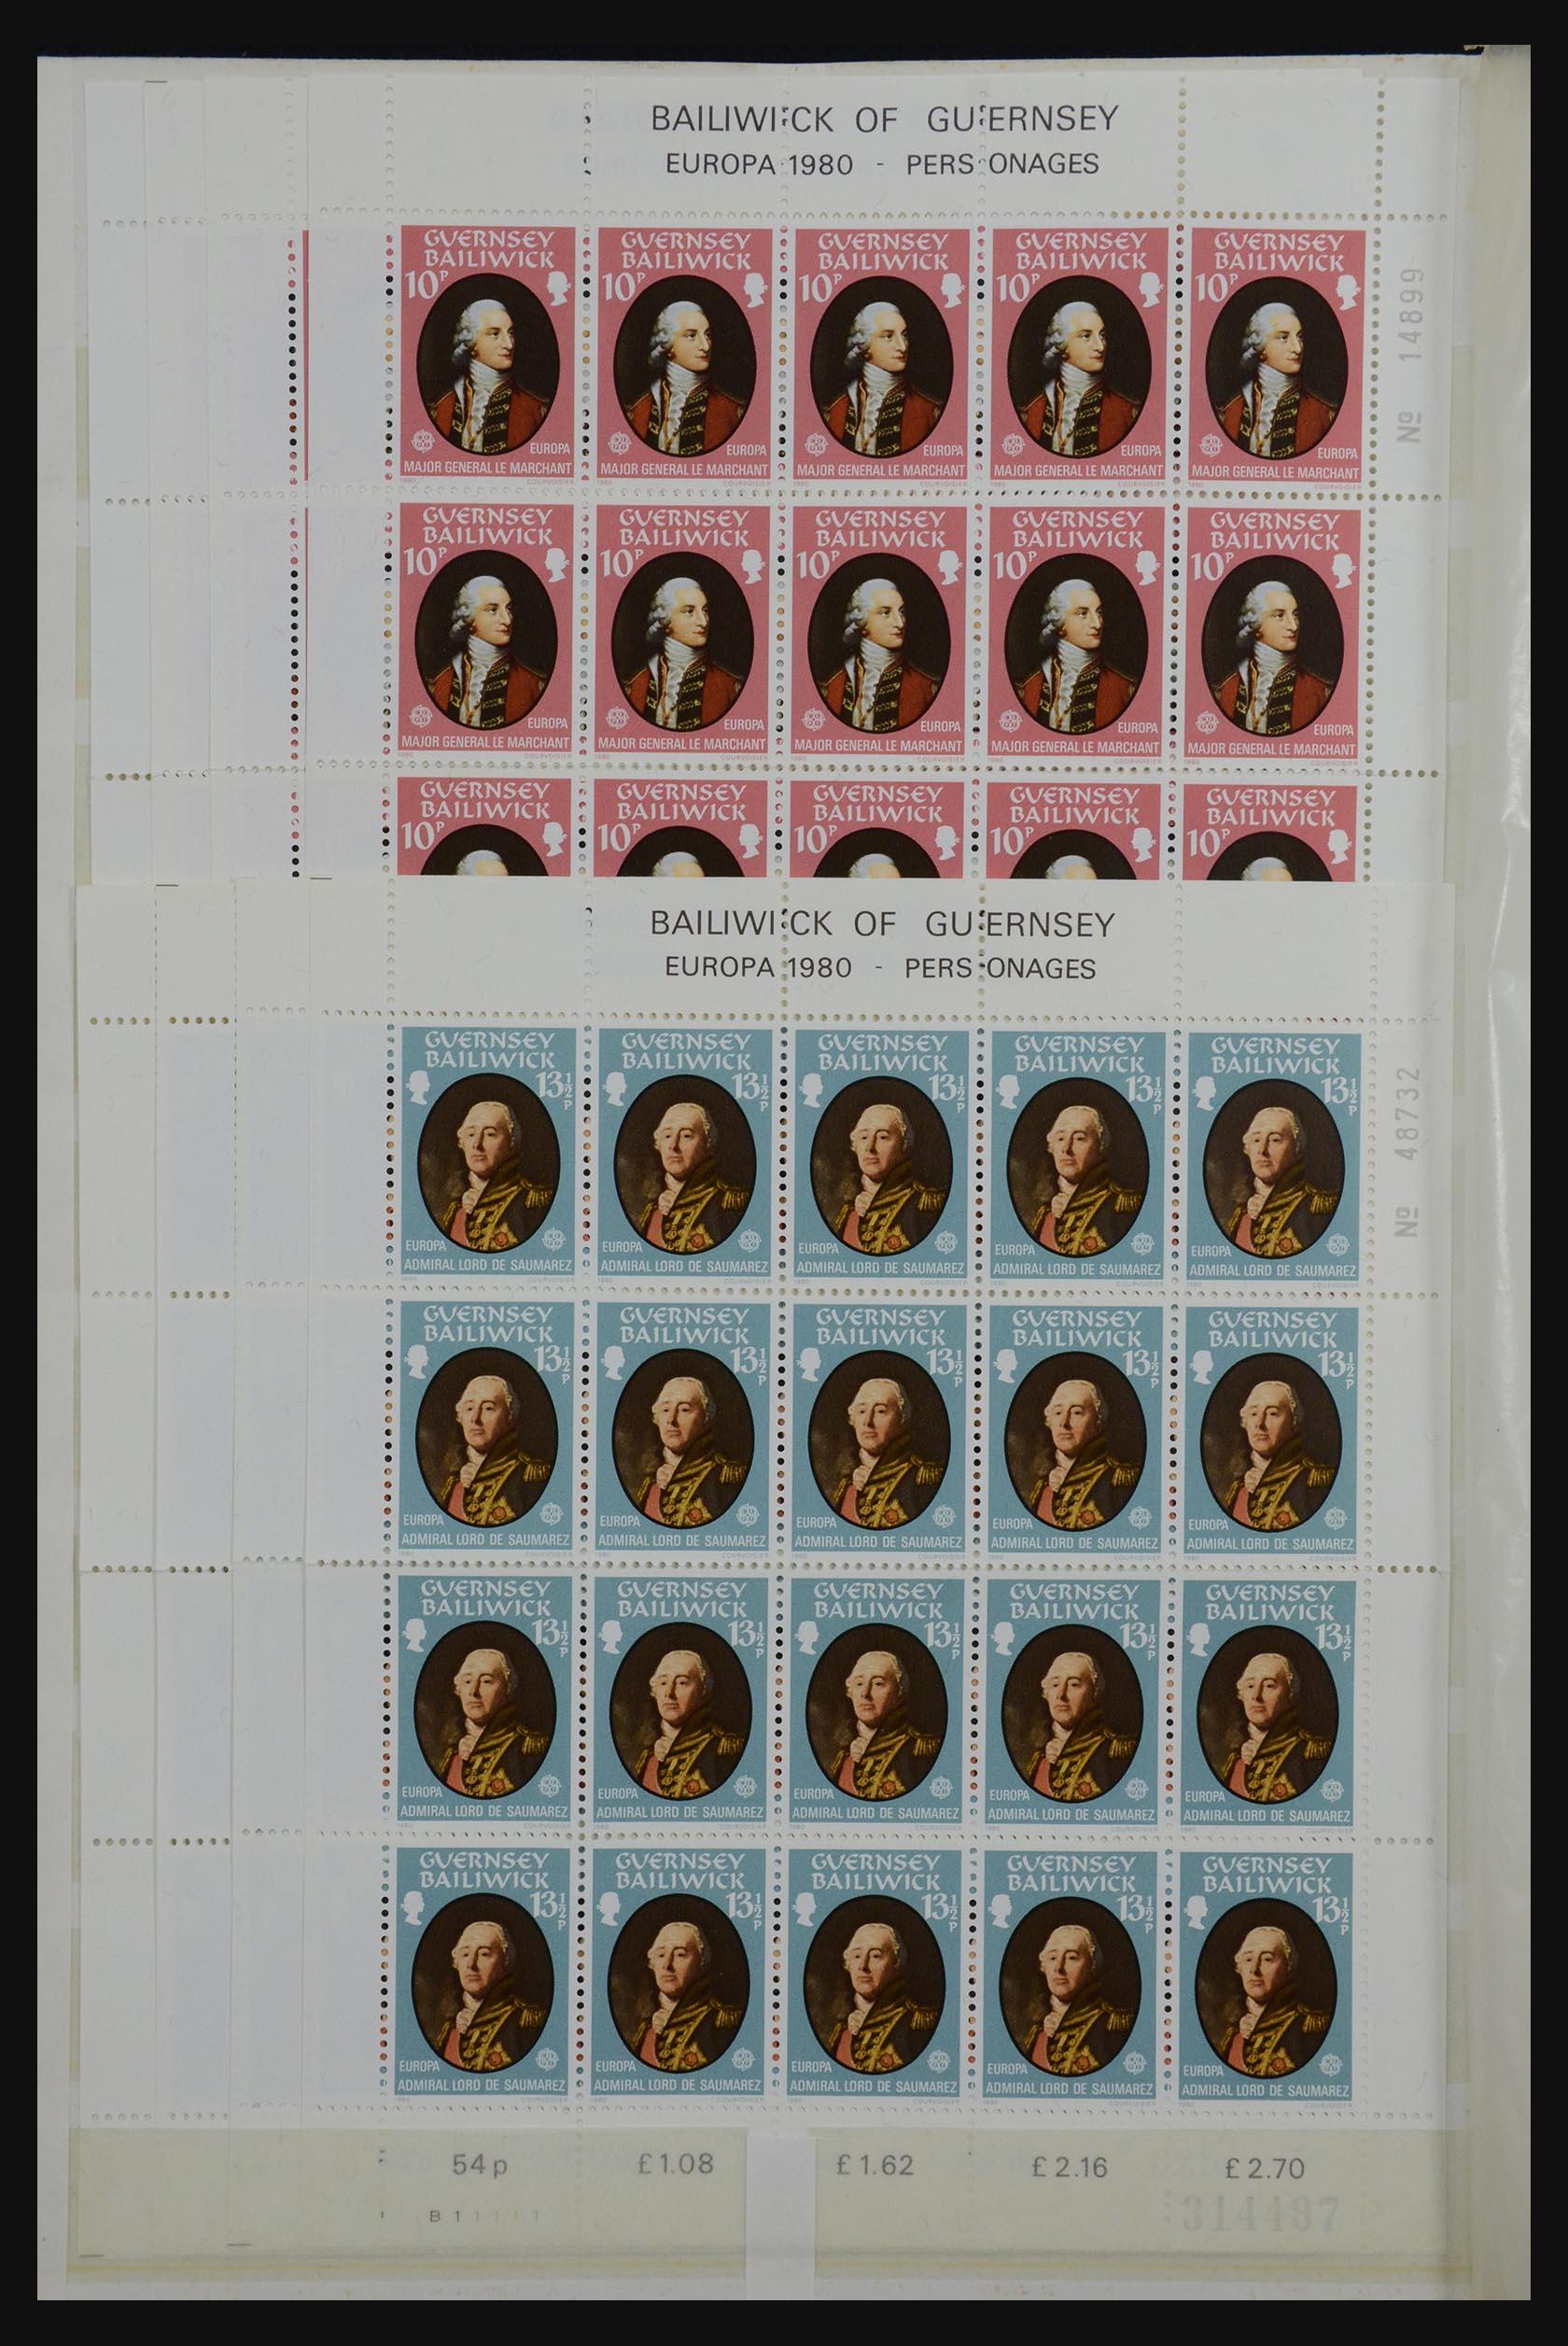 32180 008 - 32180 Guernsey 1972-1992.